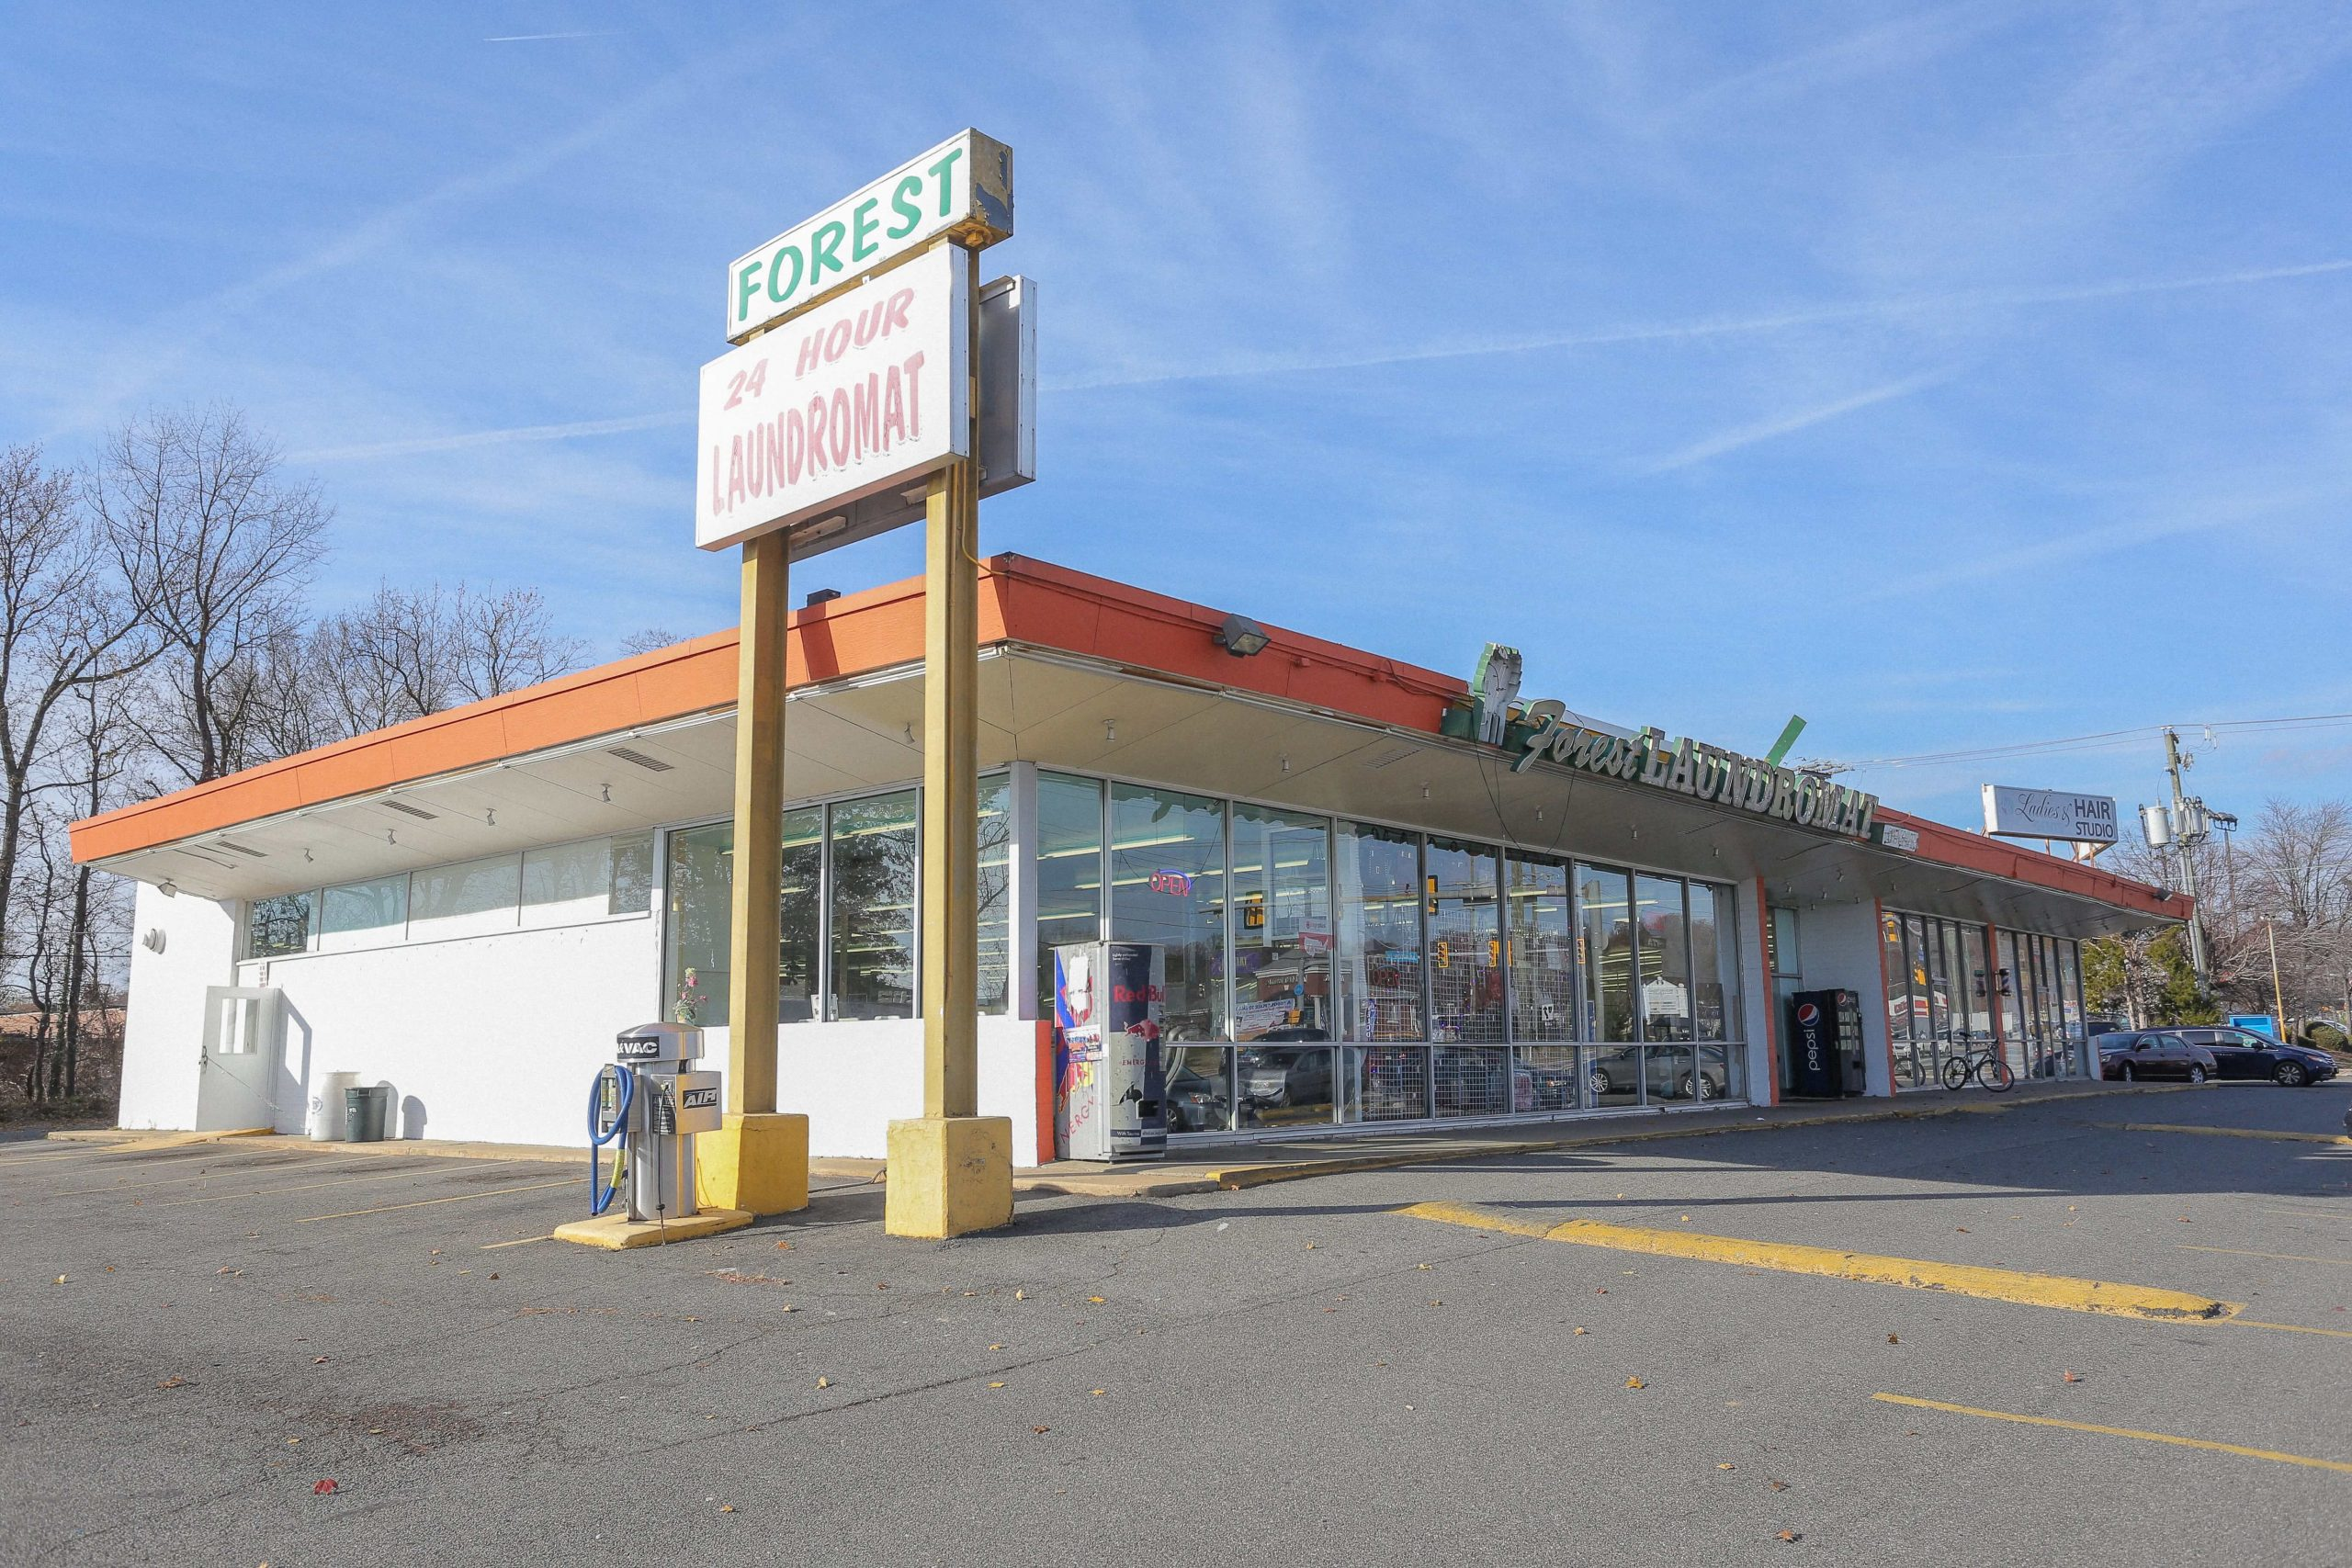 Richmond Highway Forest Laundromat